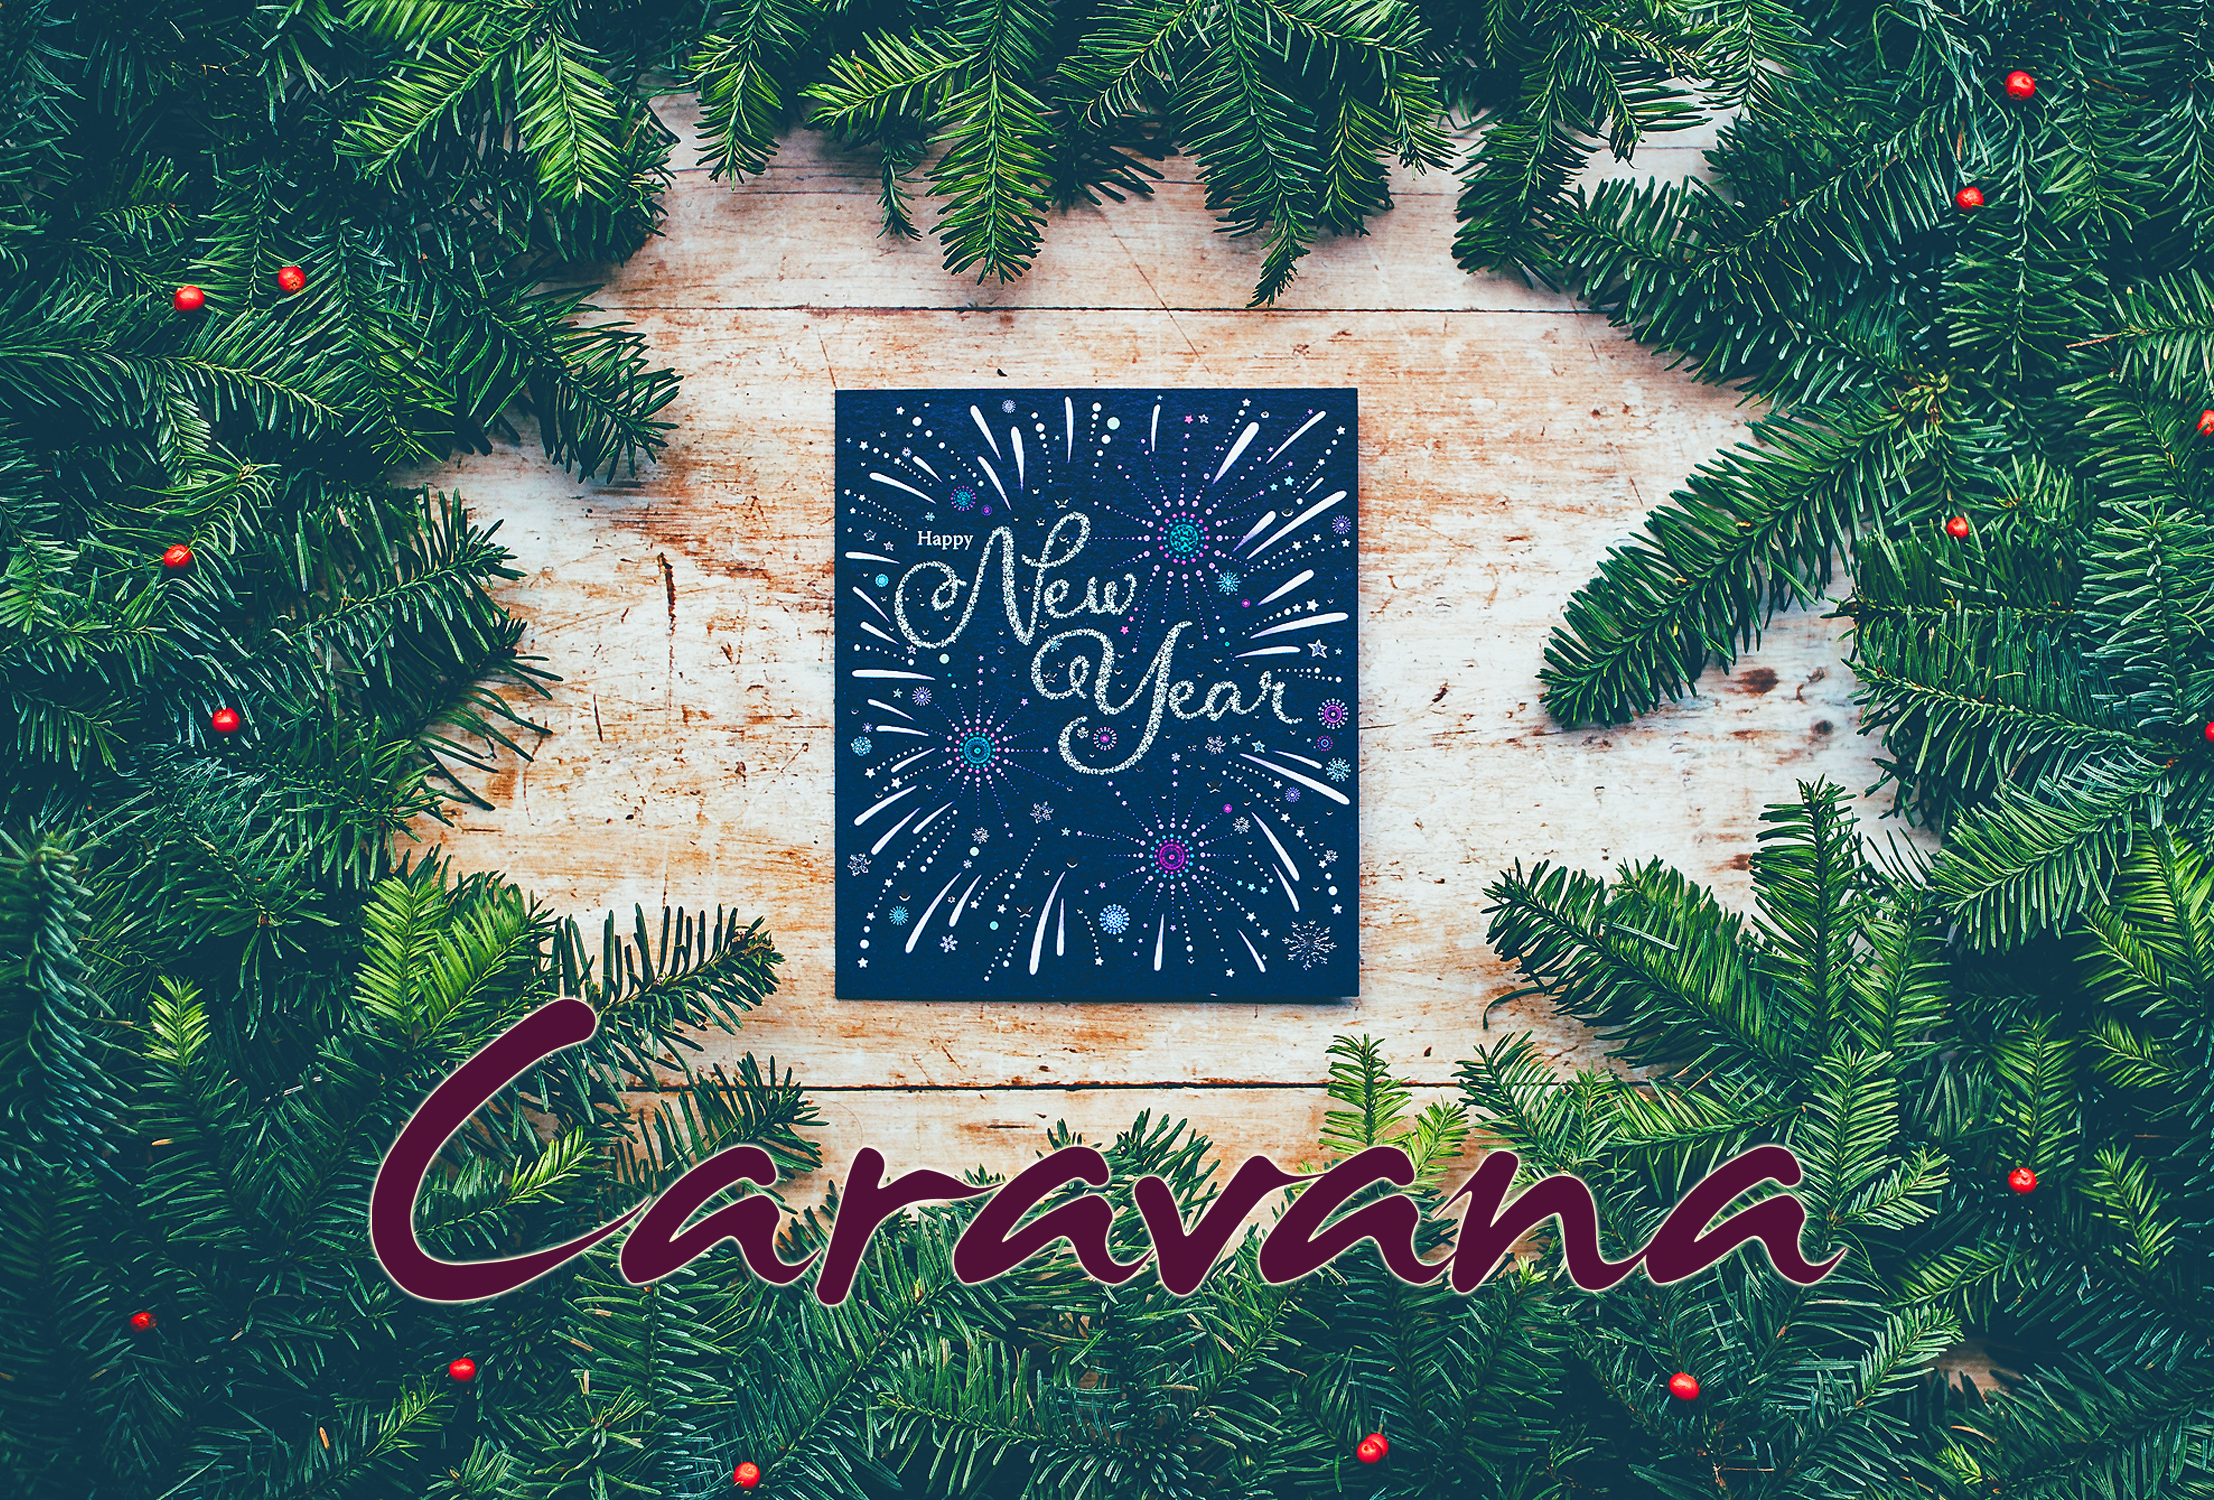 2018 is Just around the corner! Caravana Jewelry and ...